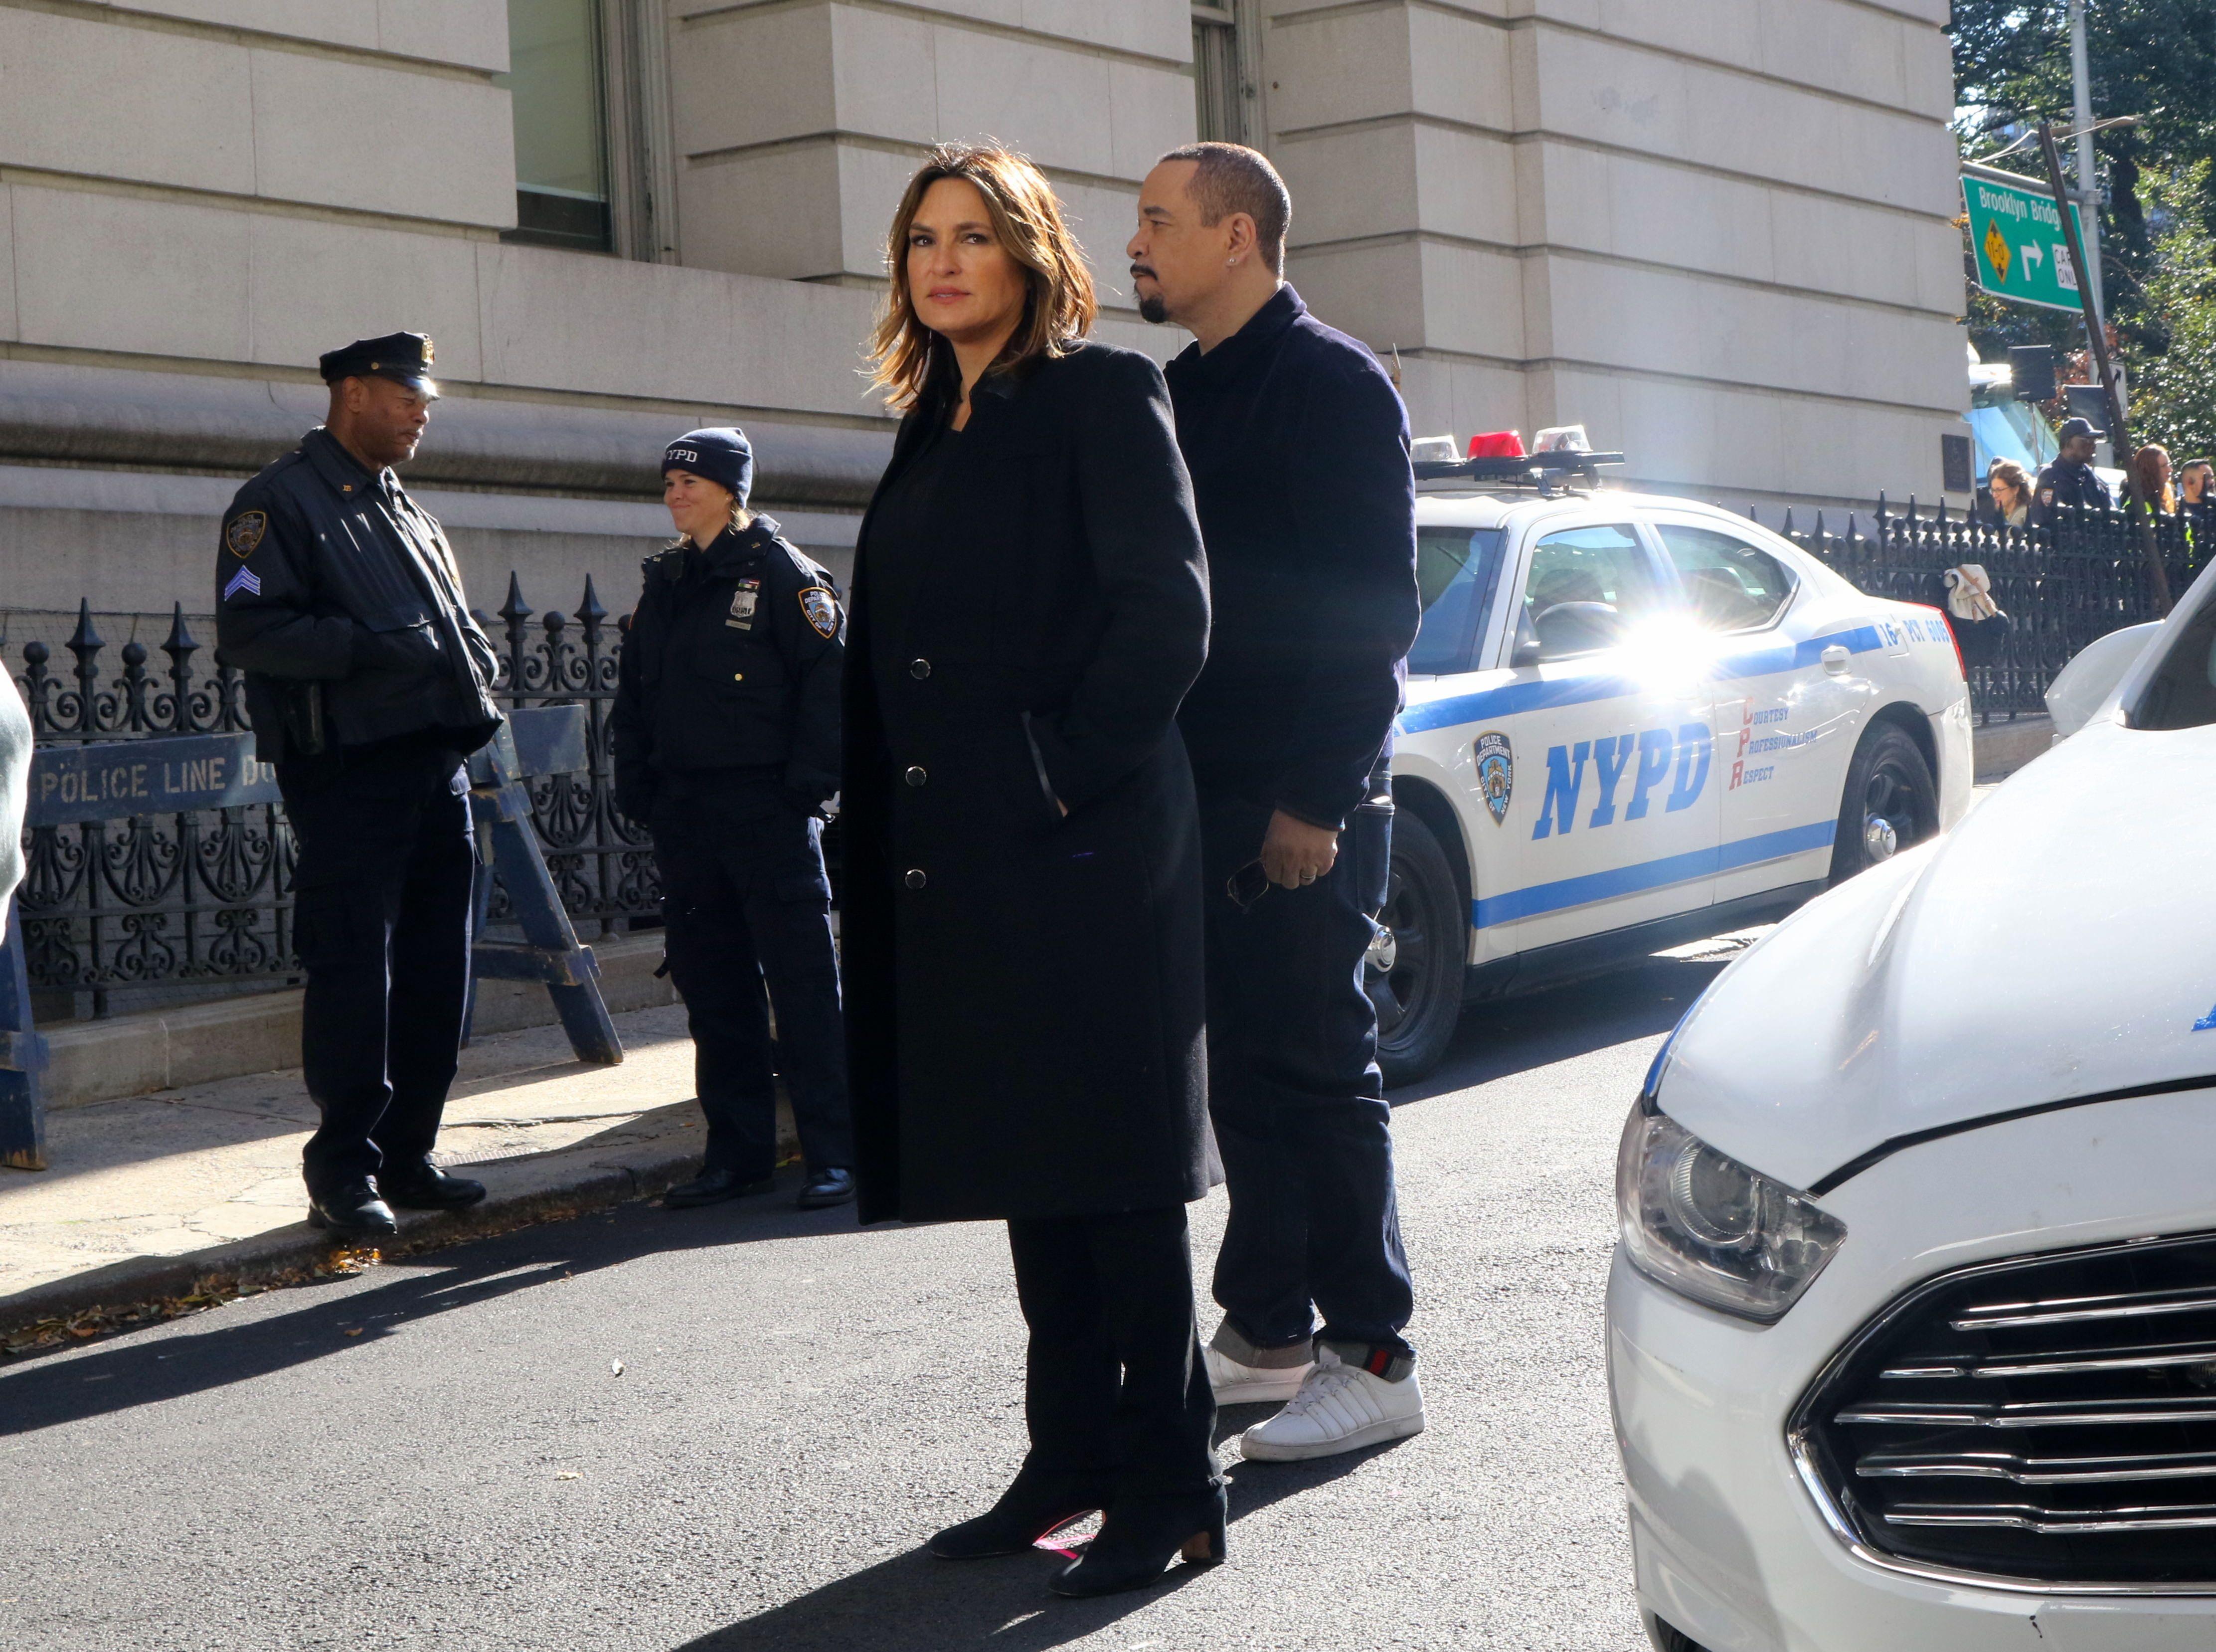 Mariska Hargitay and Ice-T in 'Law and Order: SVU'